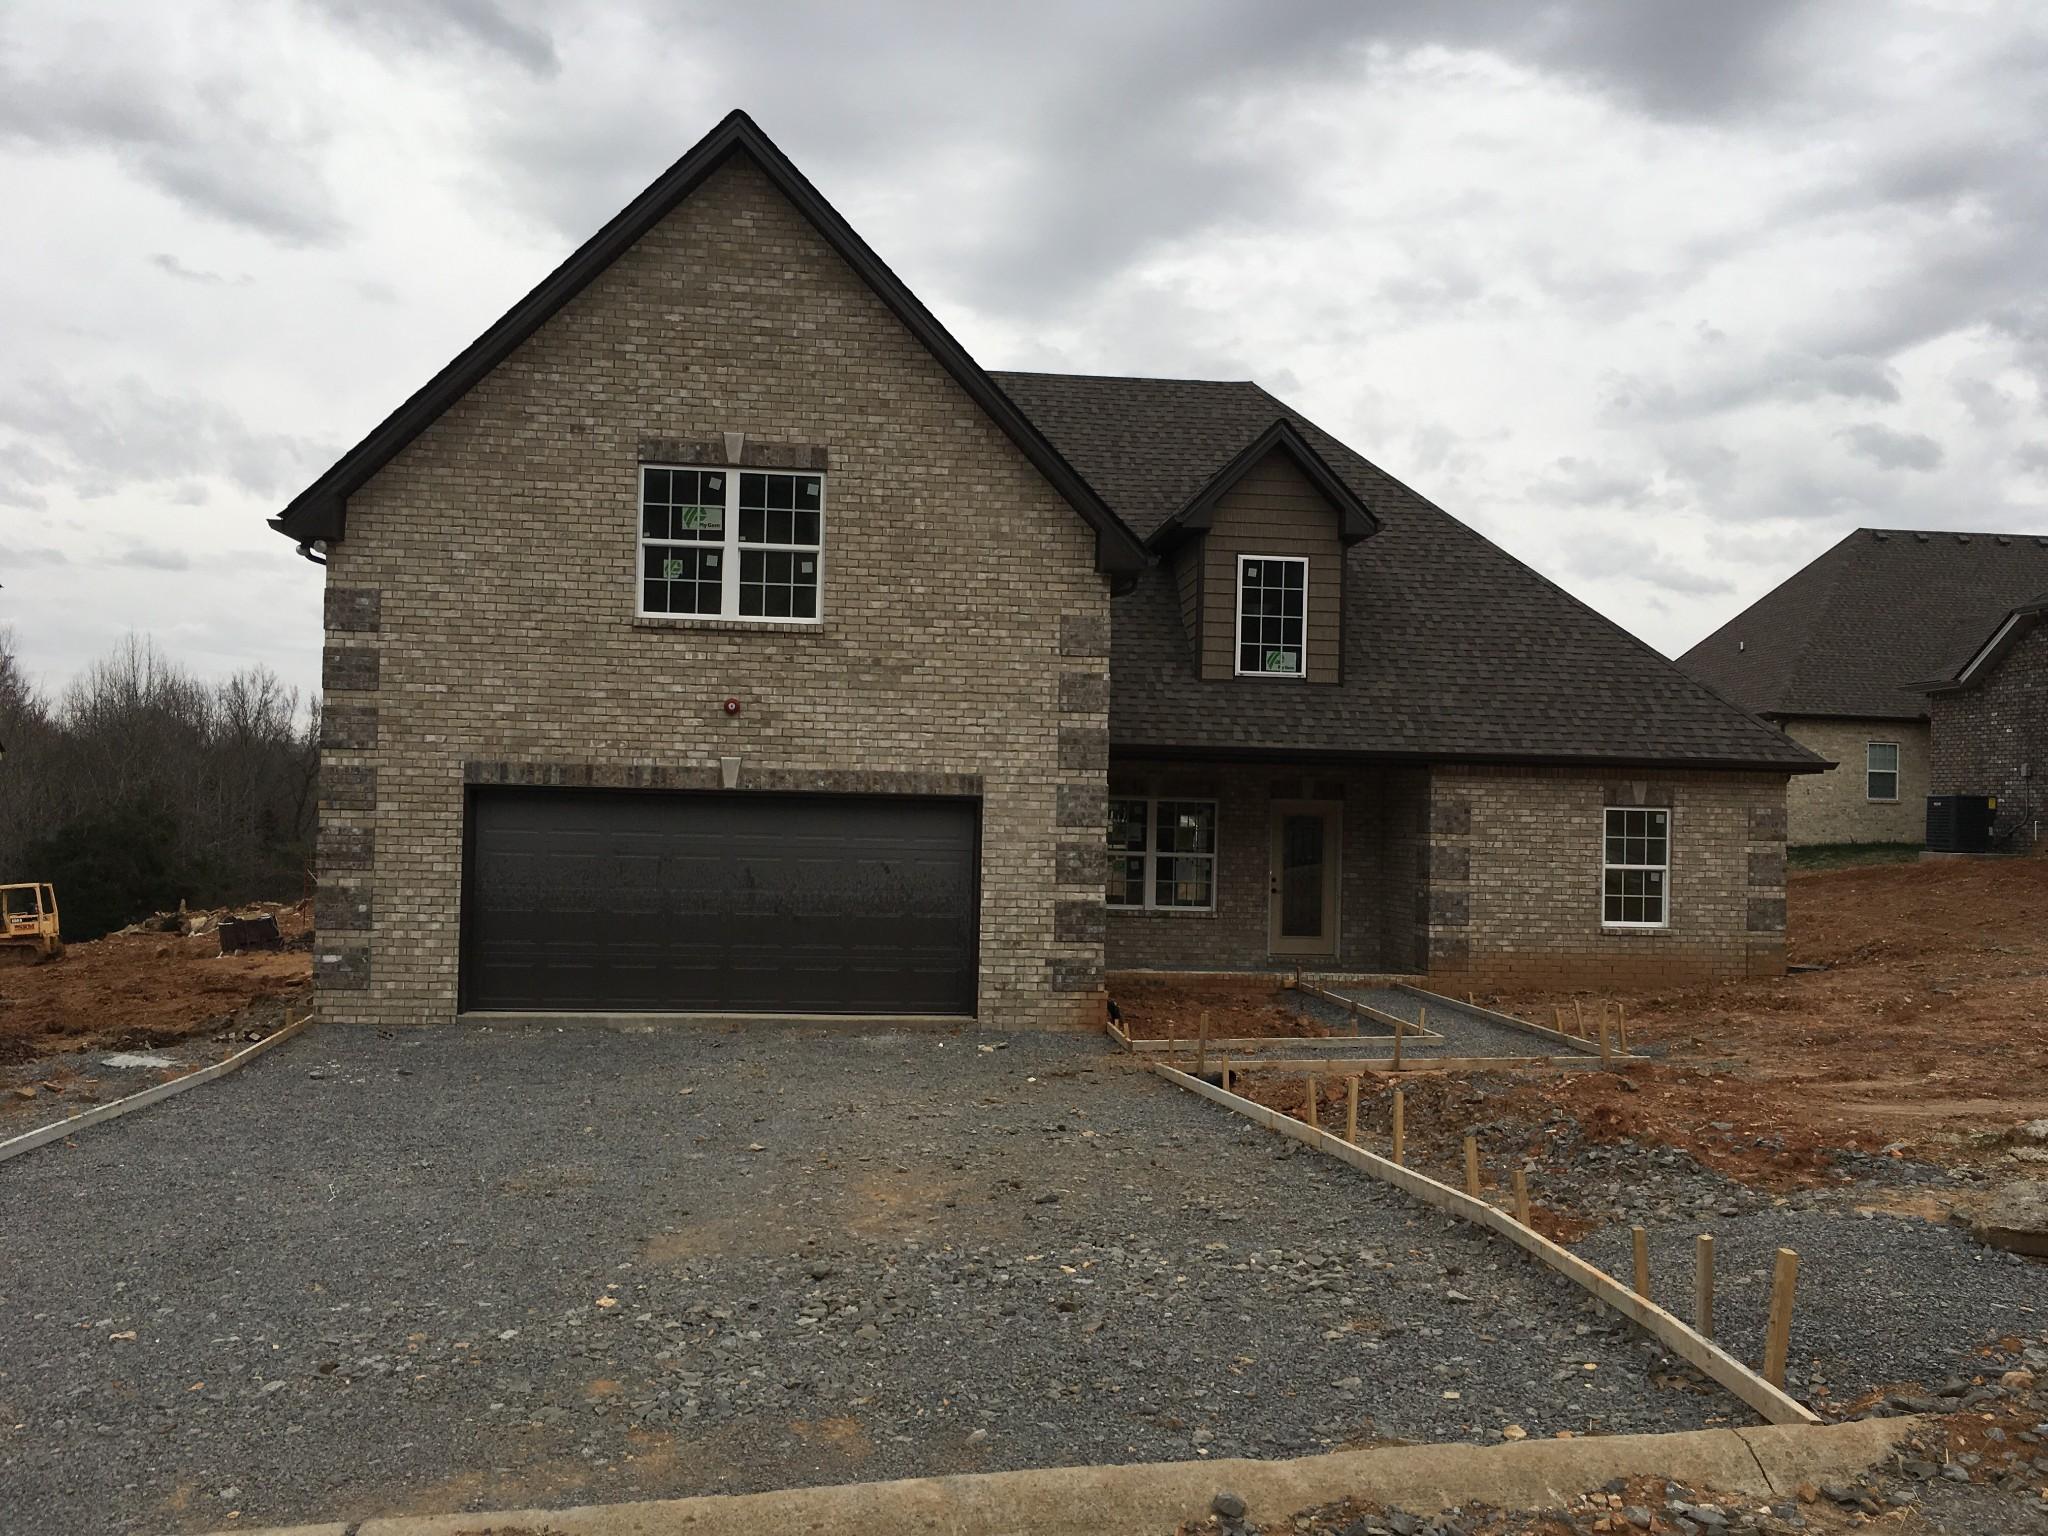 25 Grace Meade lot 25, Ashland City, TN 37015 - Ashland City, TN real estate listing